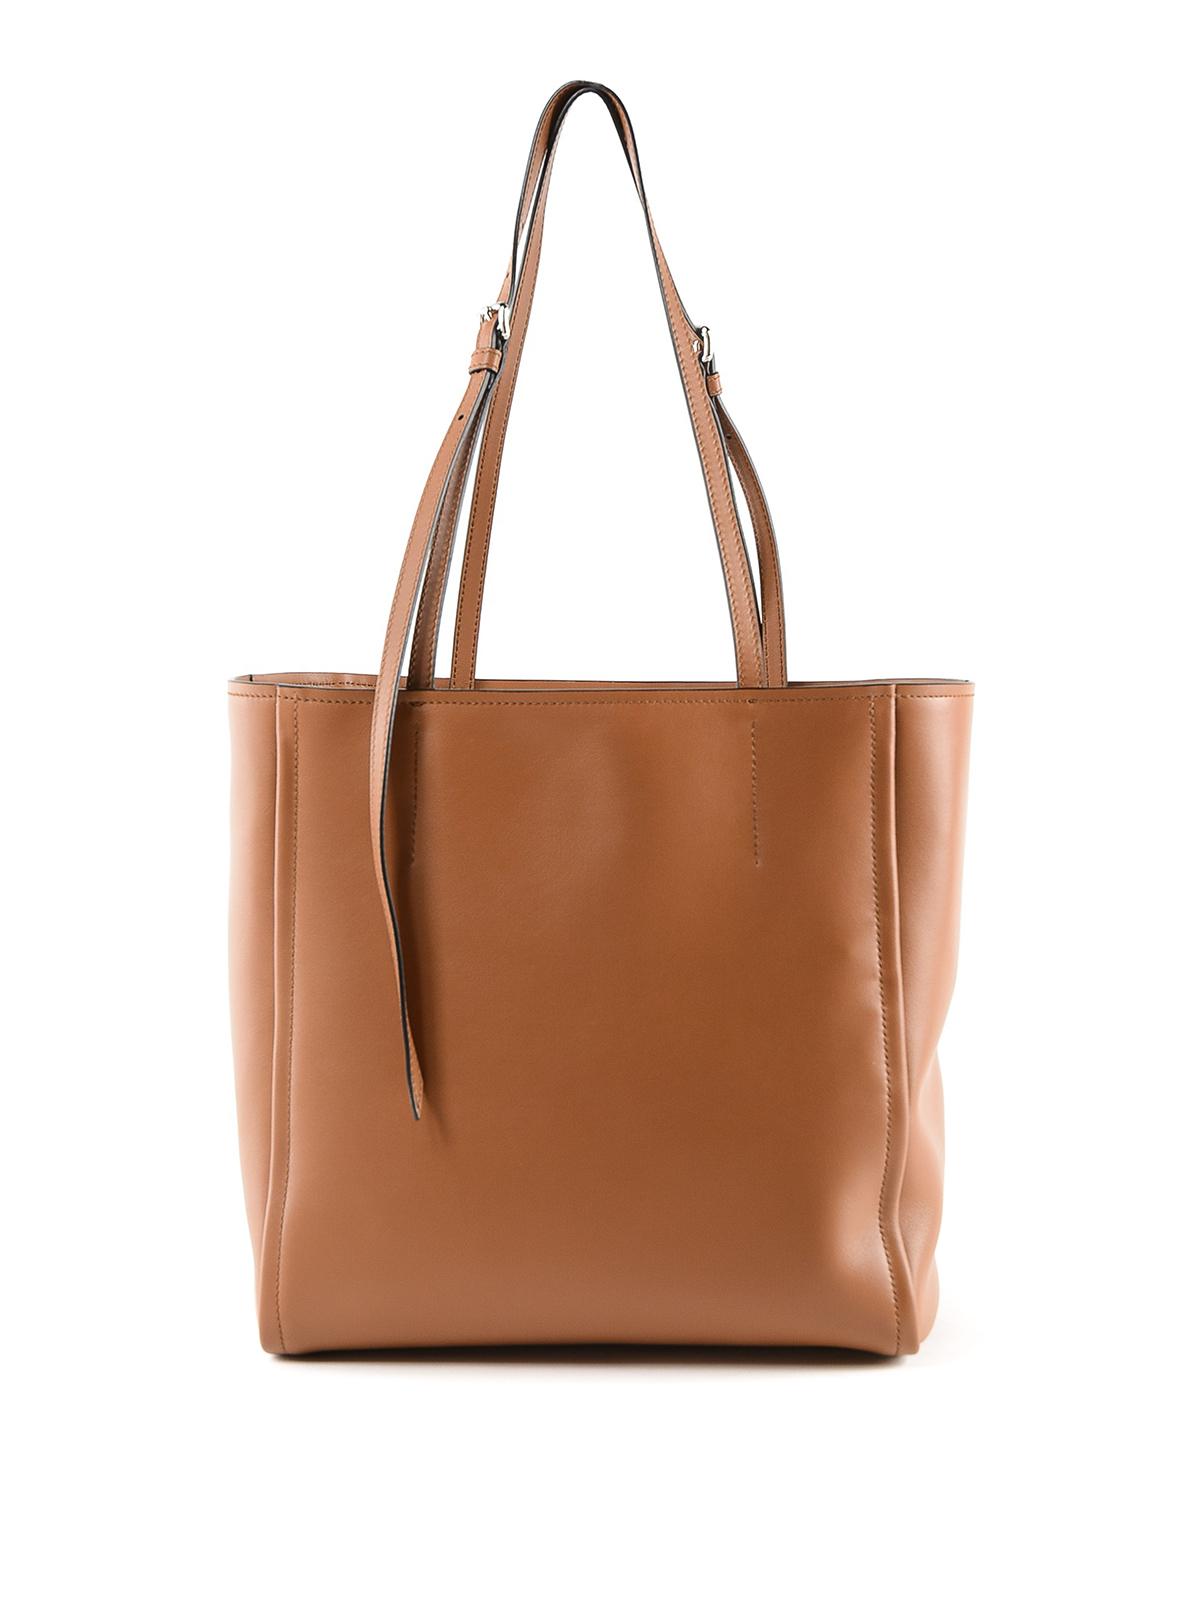 6d3ae8442118 Prada - Concept small leather tote bag - totes bags - 1BG2092B2J XI1